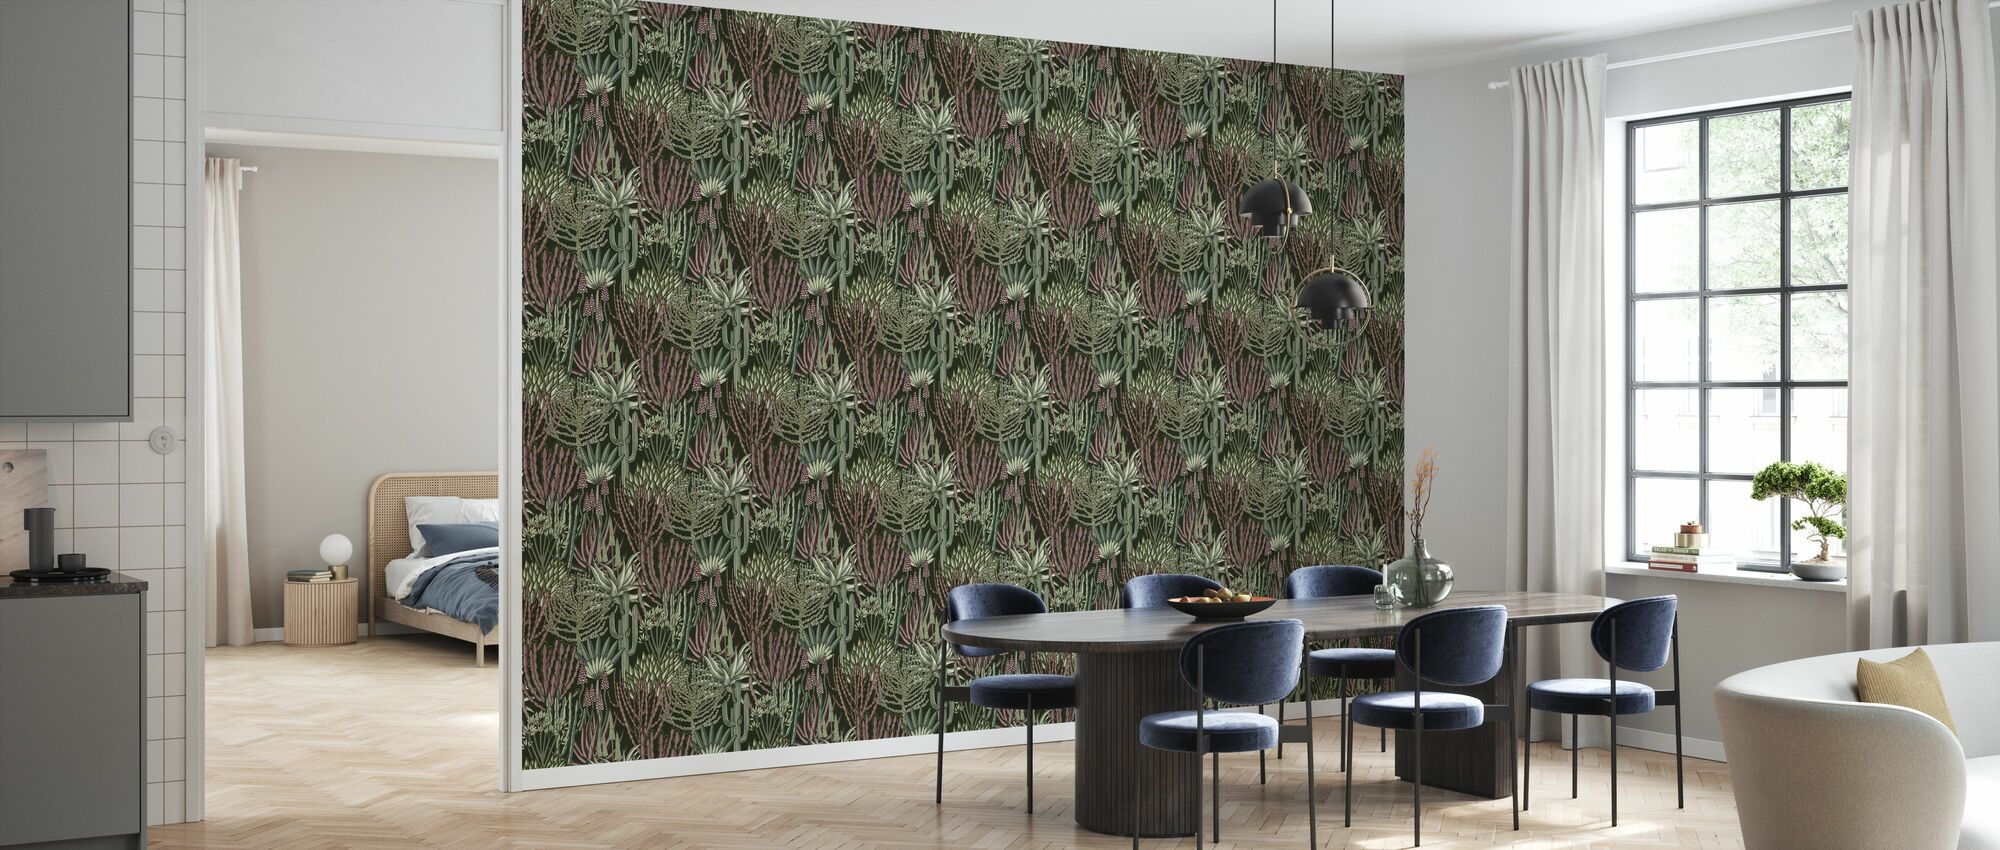 Euphorbia Skov - Camouflage - Tapet - Køkken